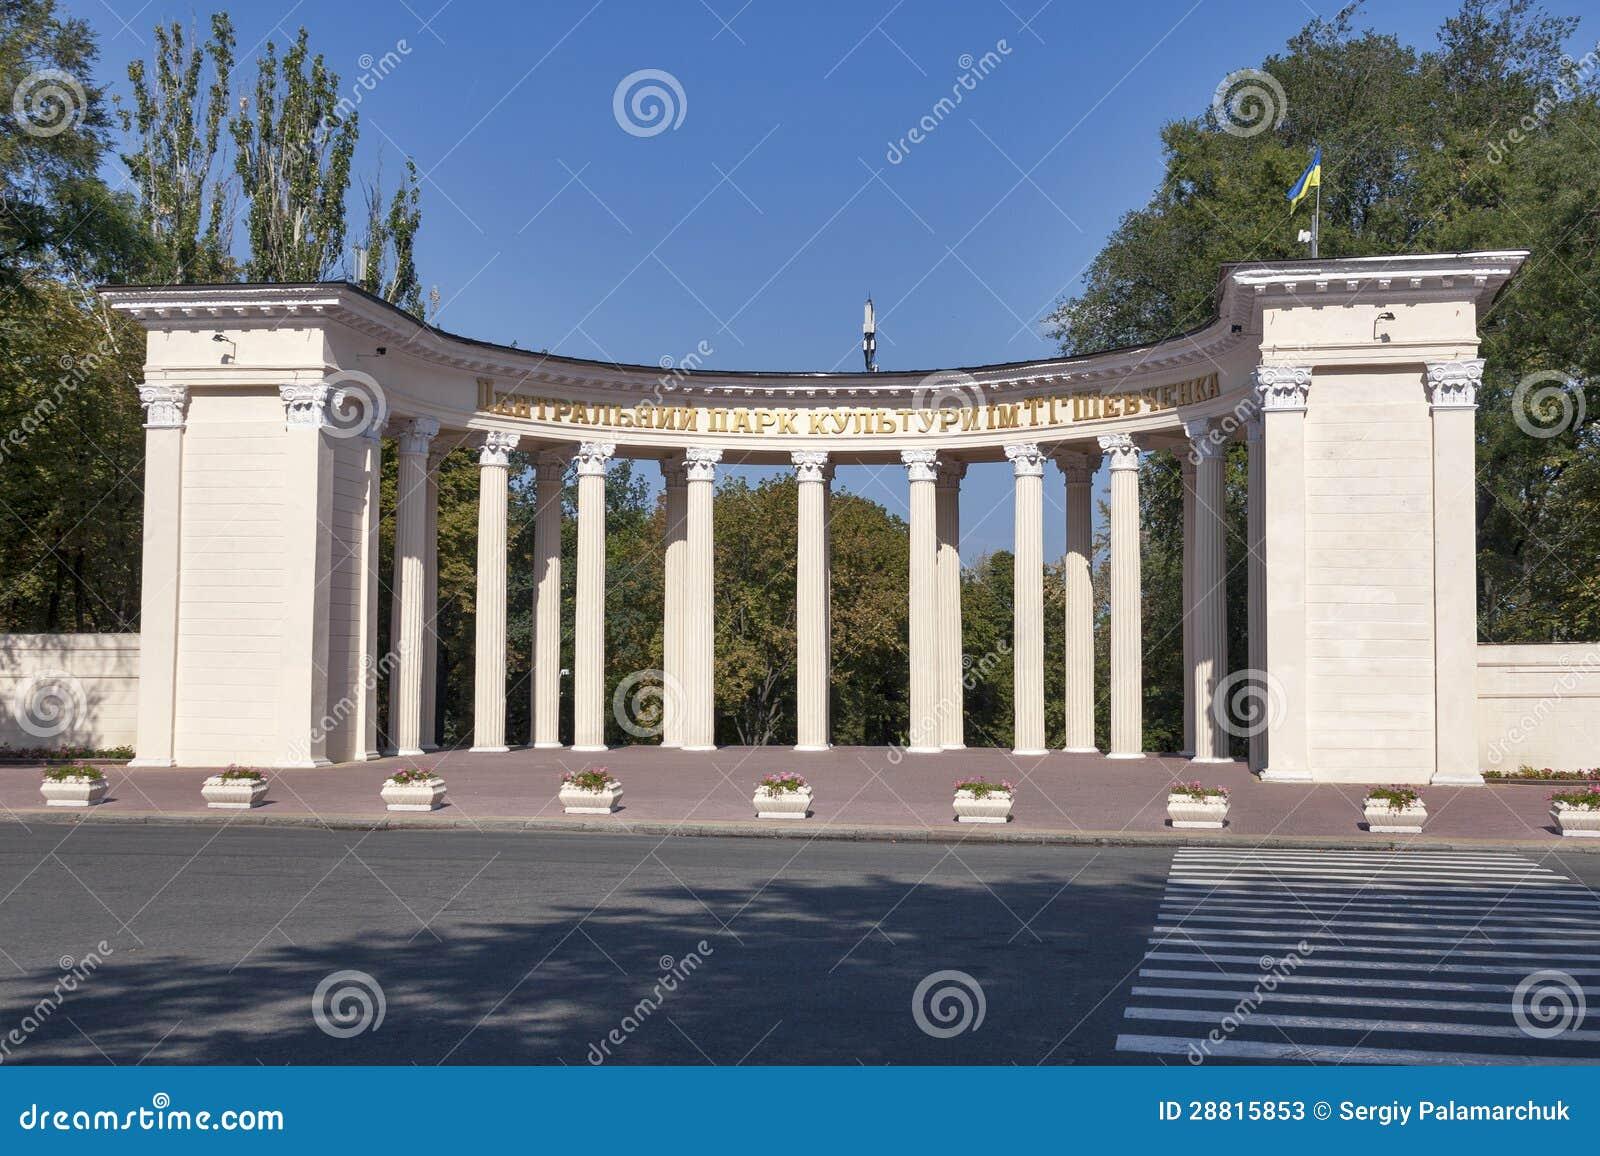 Dnipropetrovsk T. Shevchenko Recreation park